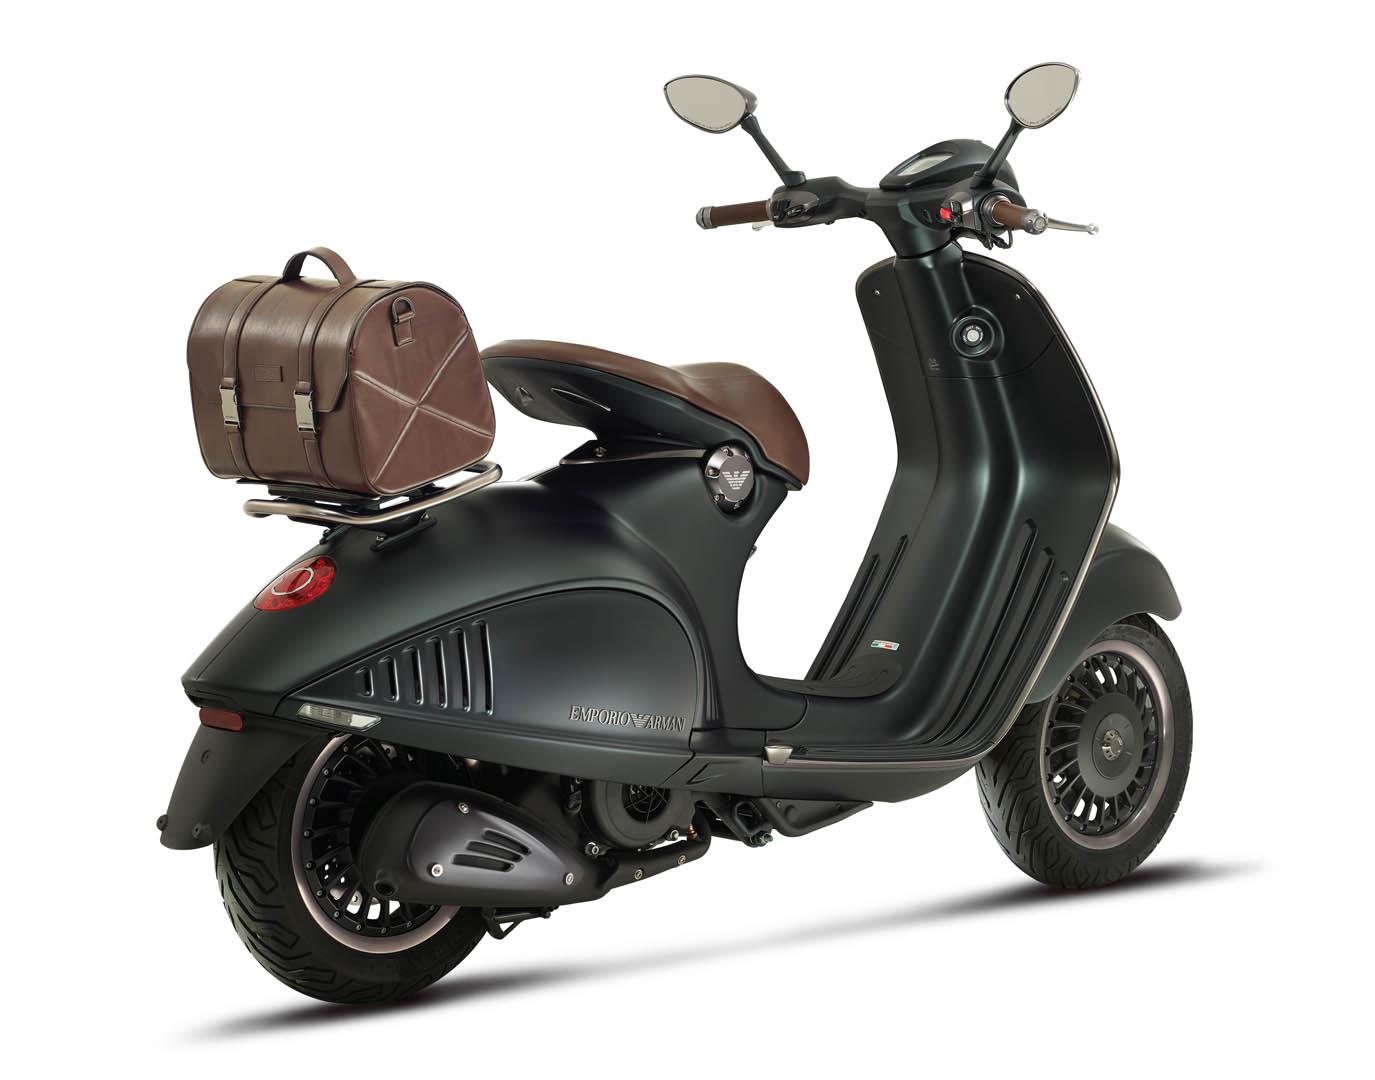 The Customized Vespa 946 Emporio Armani | Blog Purentonline